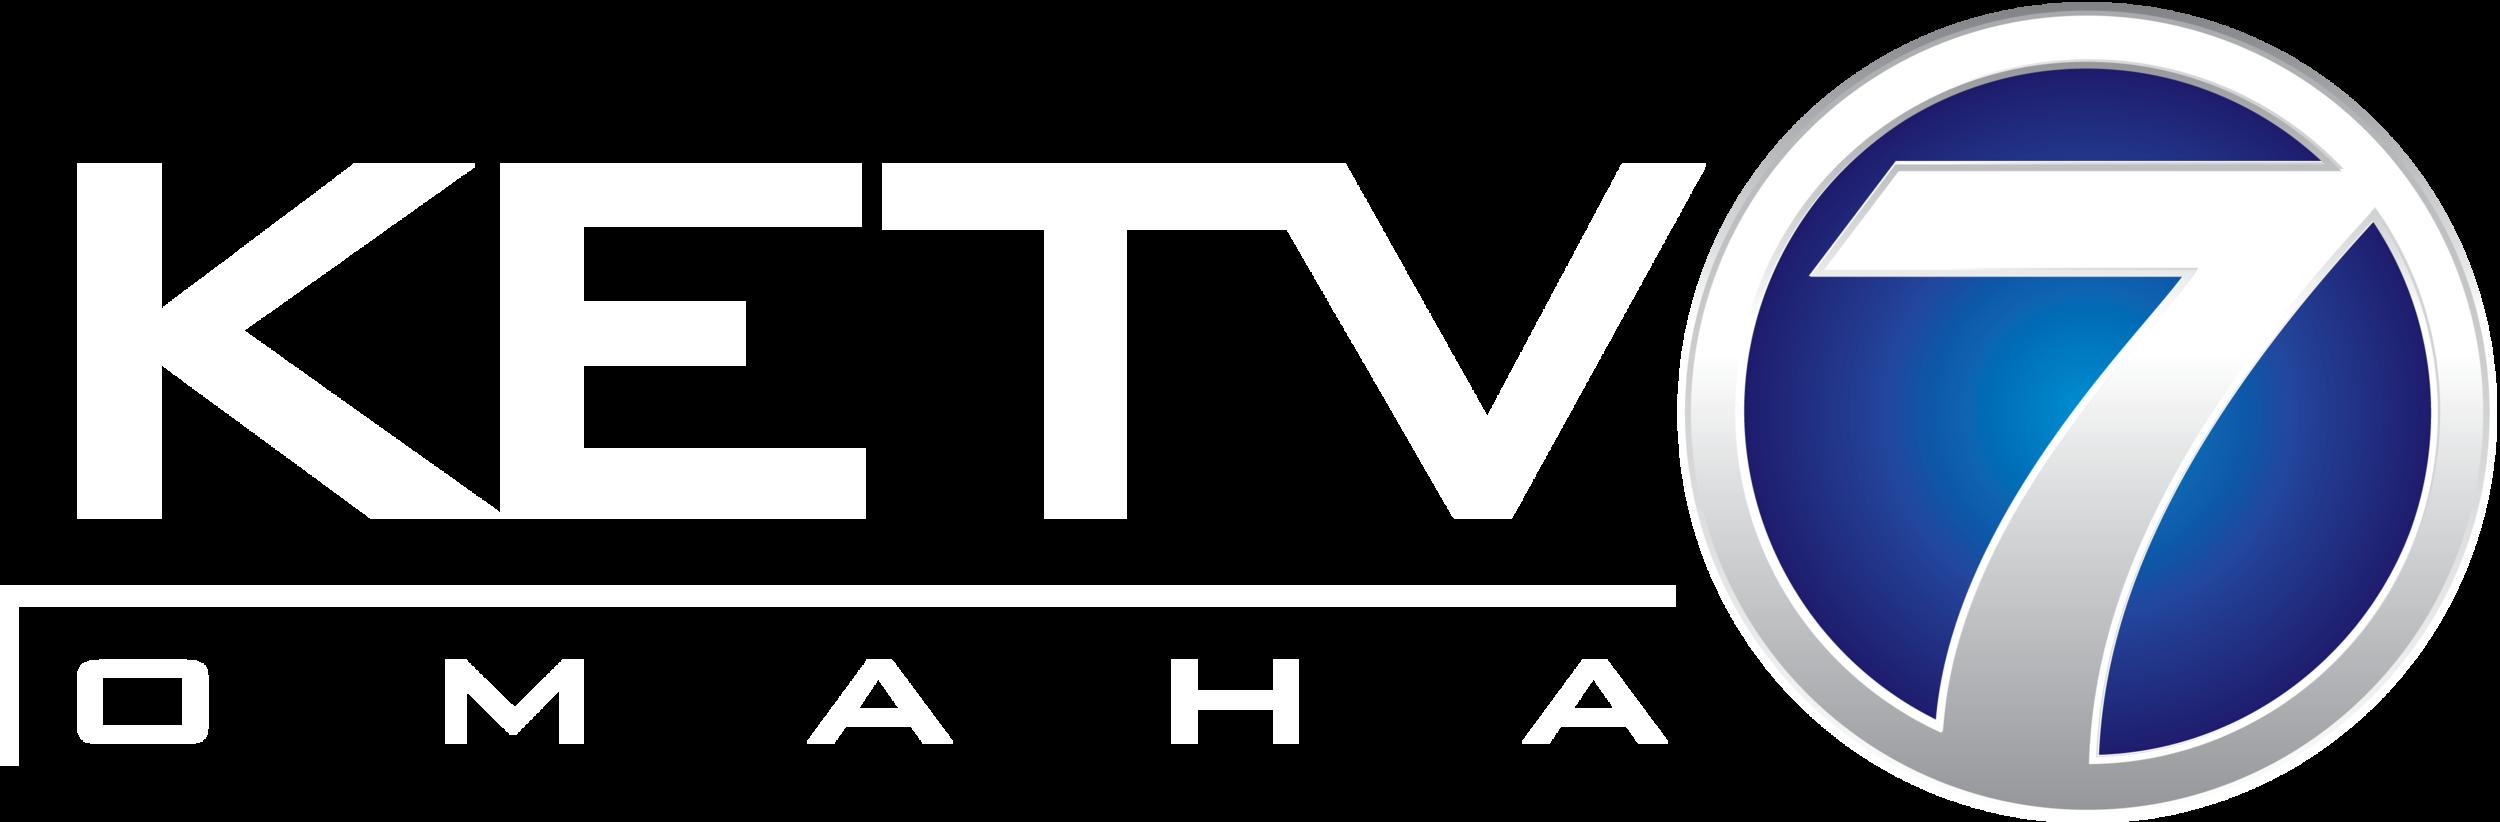 KETV7